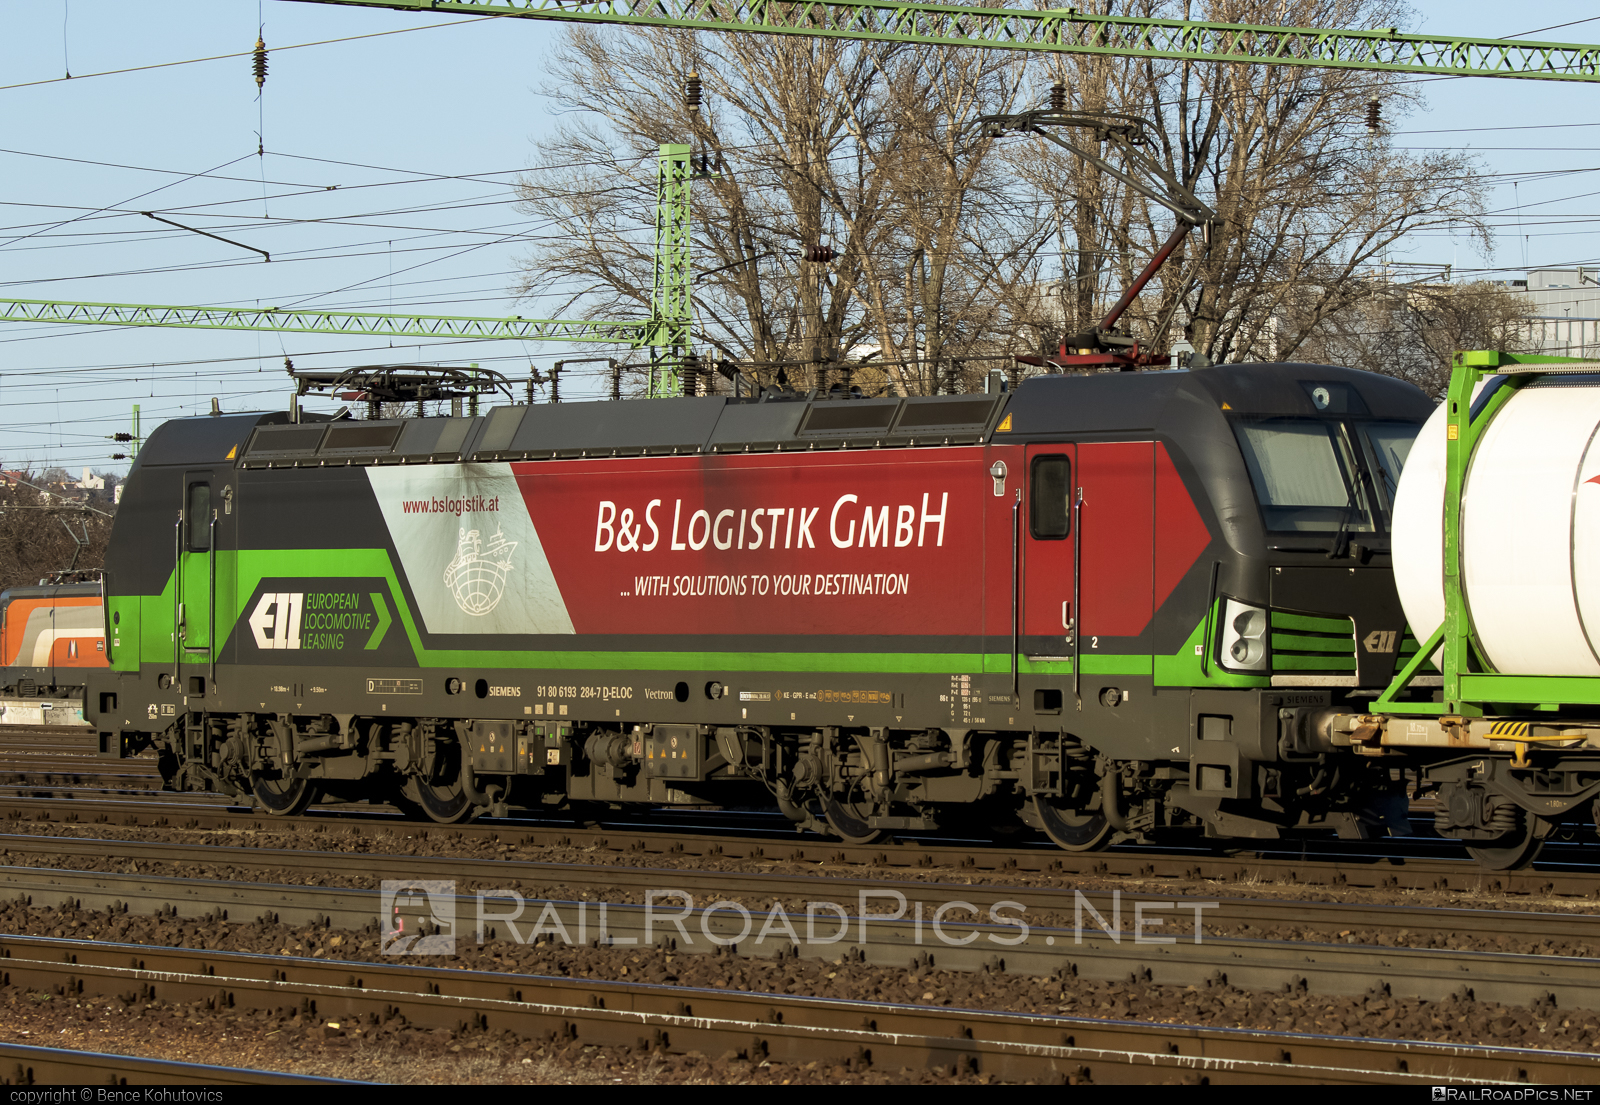 Siemens Vectron AC - 193 284 operated by Wiener Lokalbahnen Cargo GmbH #bslogistik #ell #ellgermany #eloc #europeanlocomotiveleasing #siemens #siemensvectron #siemensvectronac #vectron #vectronac #wienerlokalbahnencargo #wienerlokalbahnencargogmbh #wlc